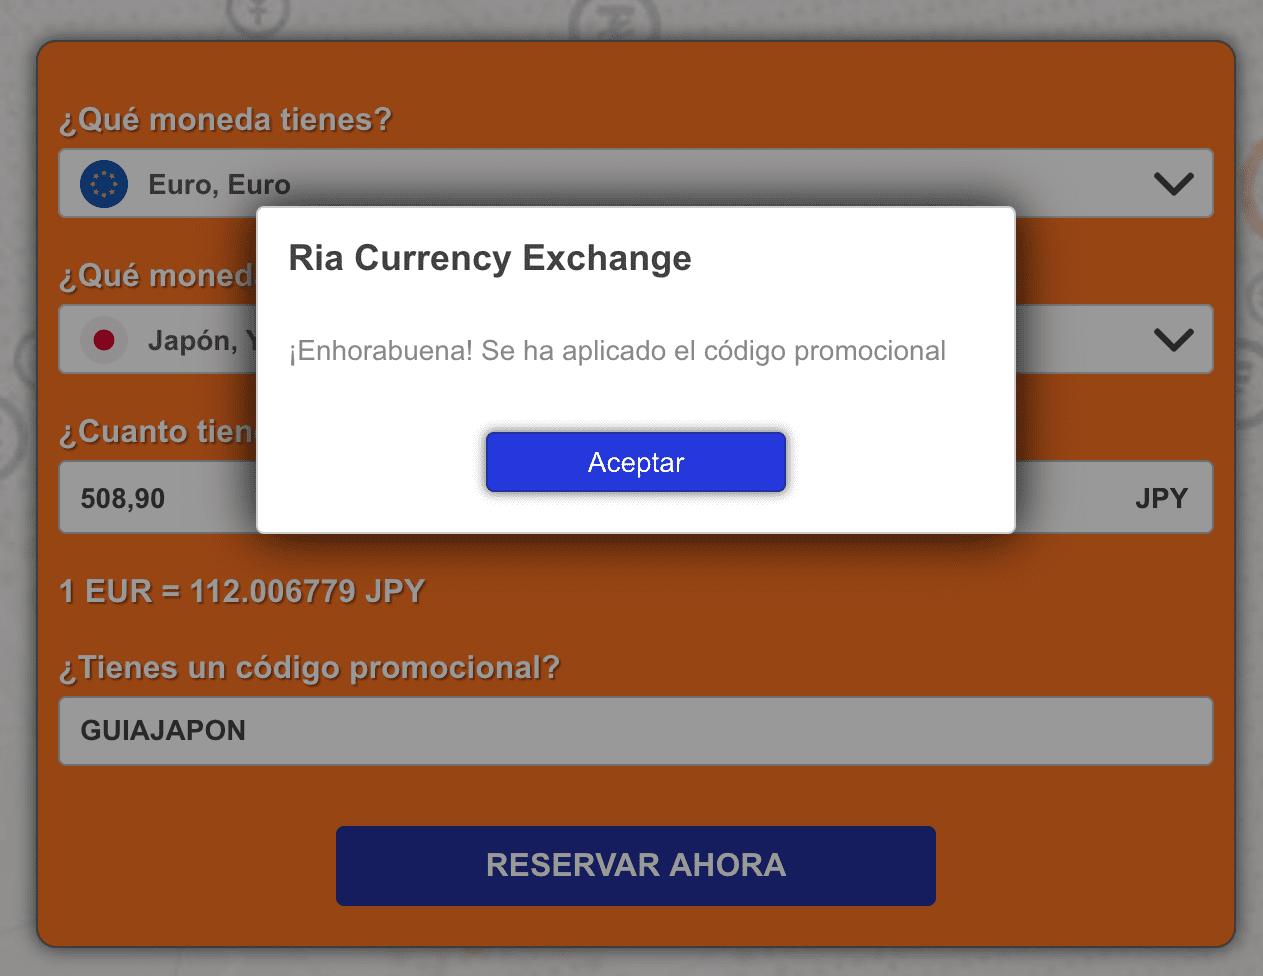 Cambio de moneda: Ria codigo promocional